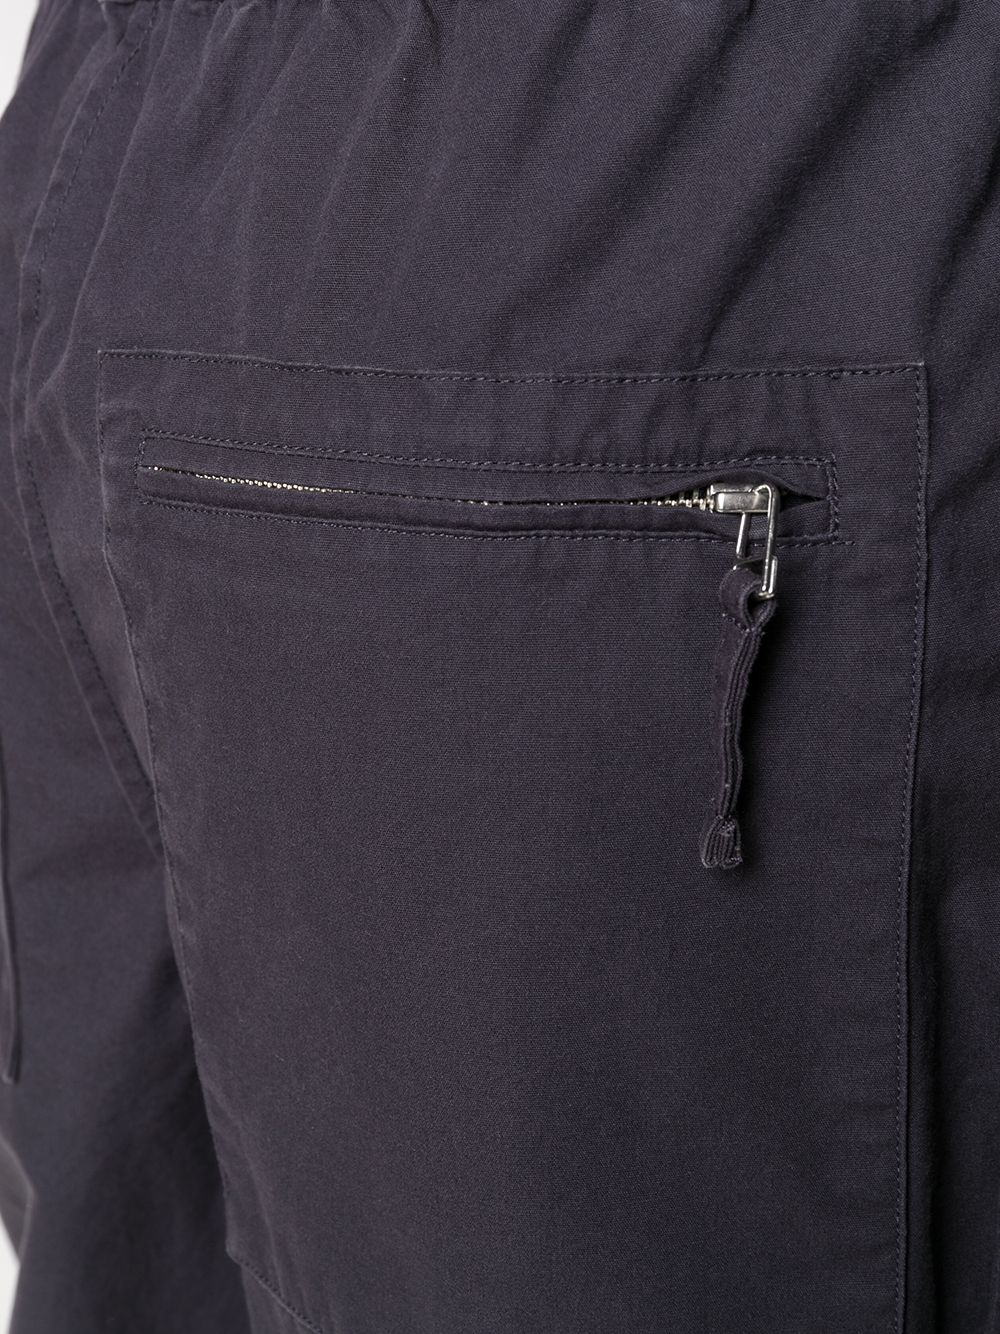 Isabel Marant pantalone tilsen uomo ISABEL MARANT | Pantaloni | PA1400-21P013H30FN